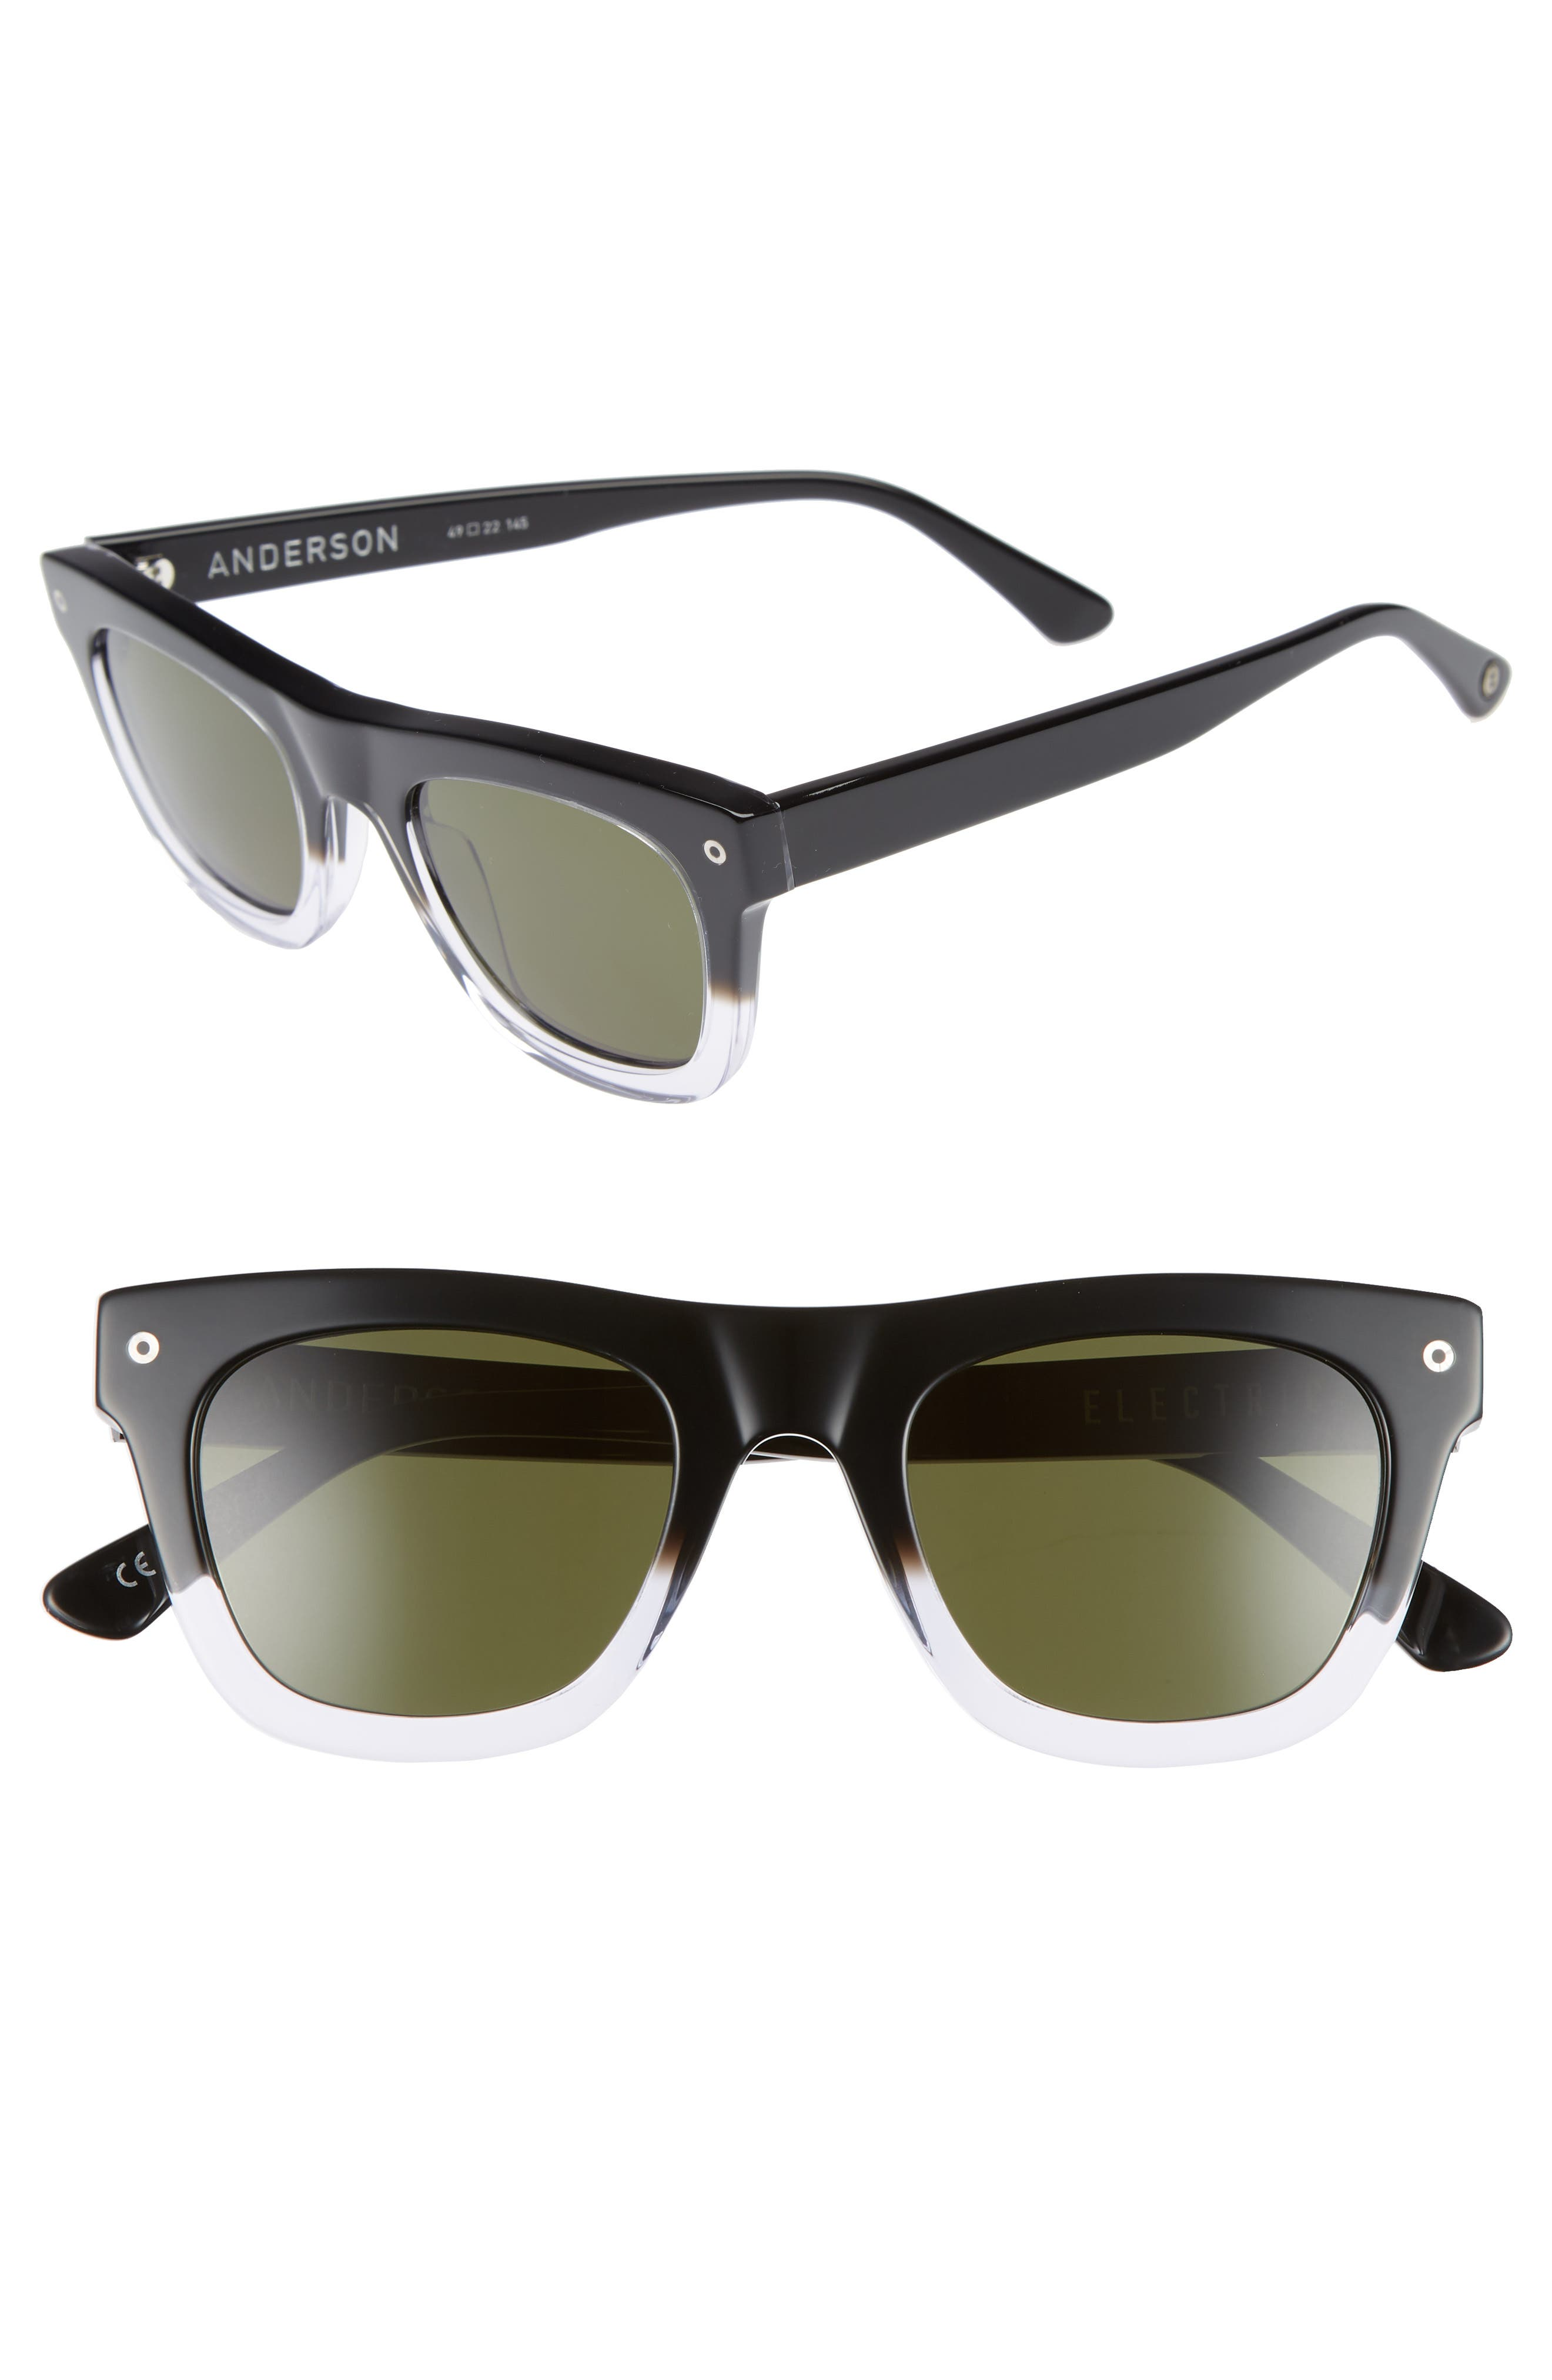 Andersen 49mm Sunglasses,                             Main thumbnail 1, color,                             BLACK CLEAR FADE/ GREY